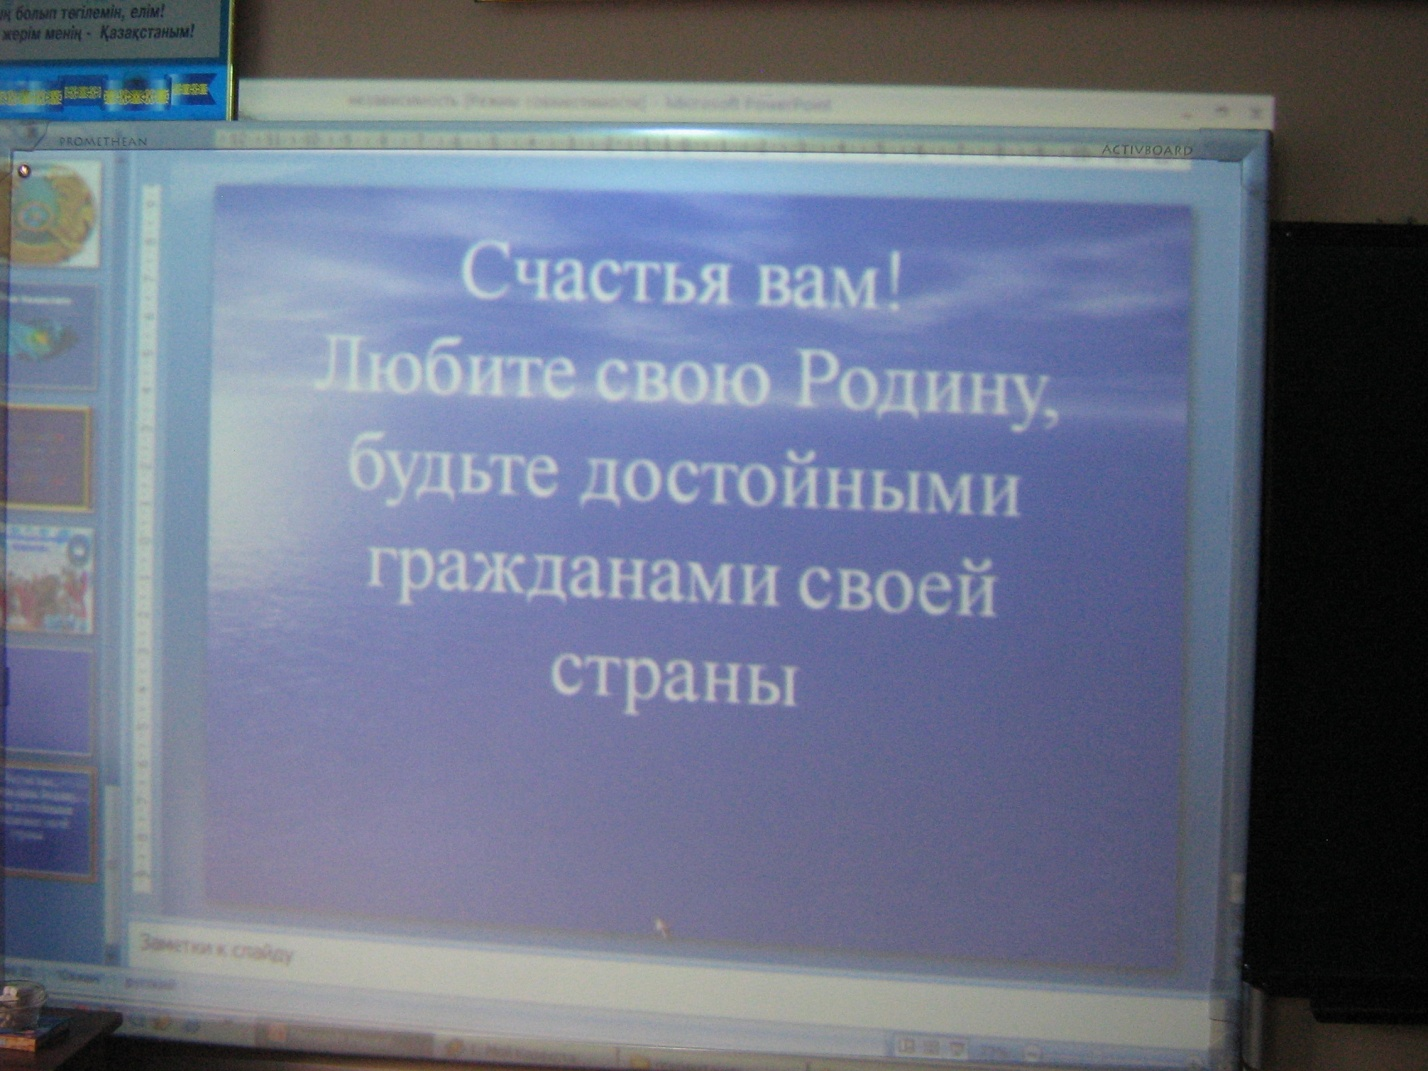 C:\Documents and Settings\Администратор\Рабочий стол\фото 3 класс\Изображение 012.jpg